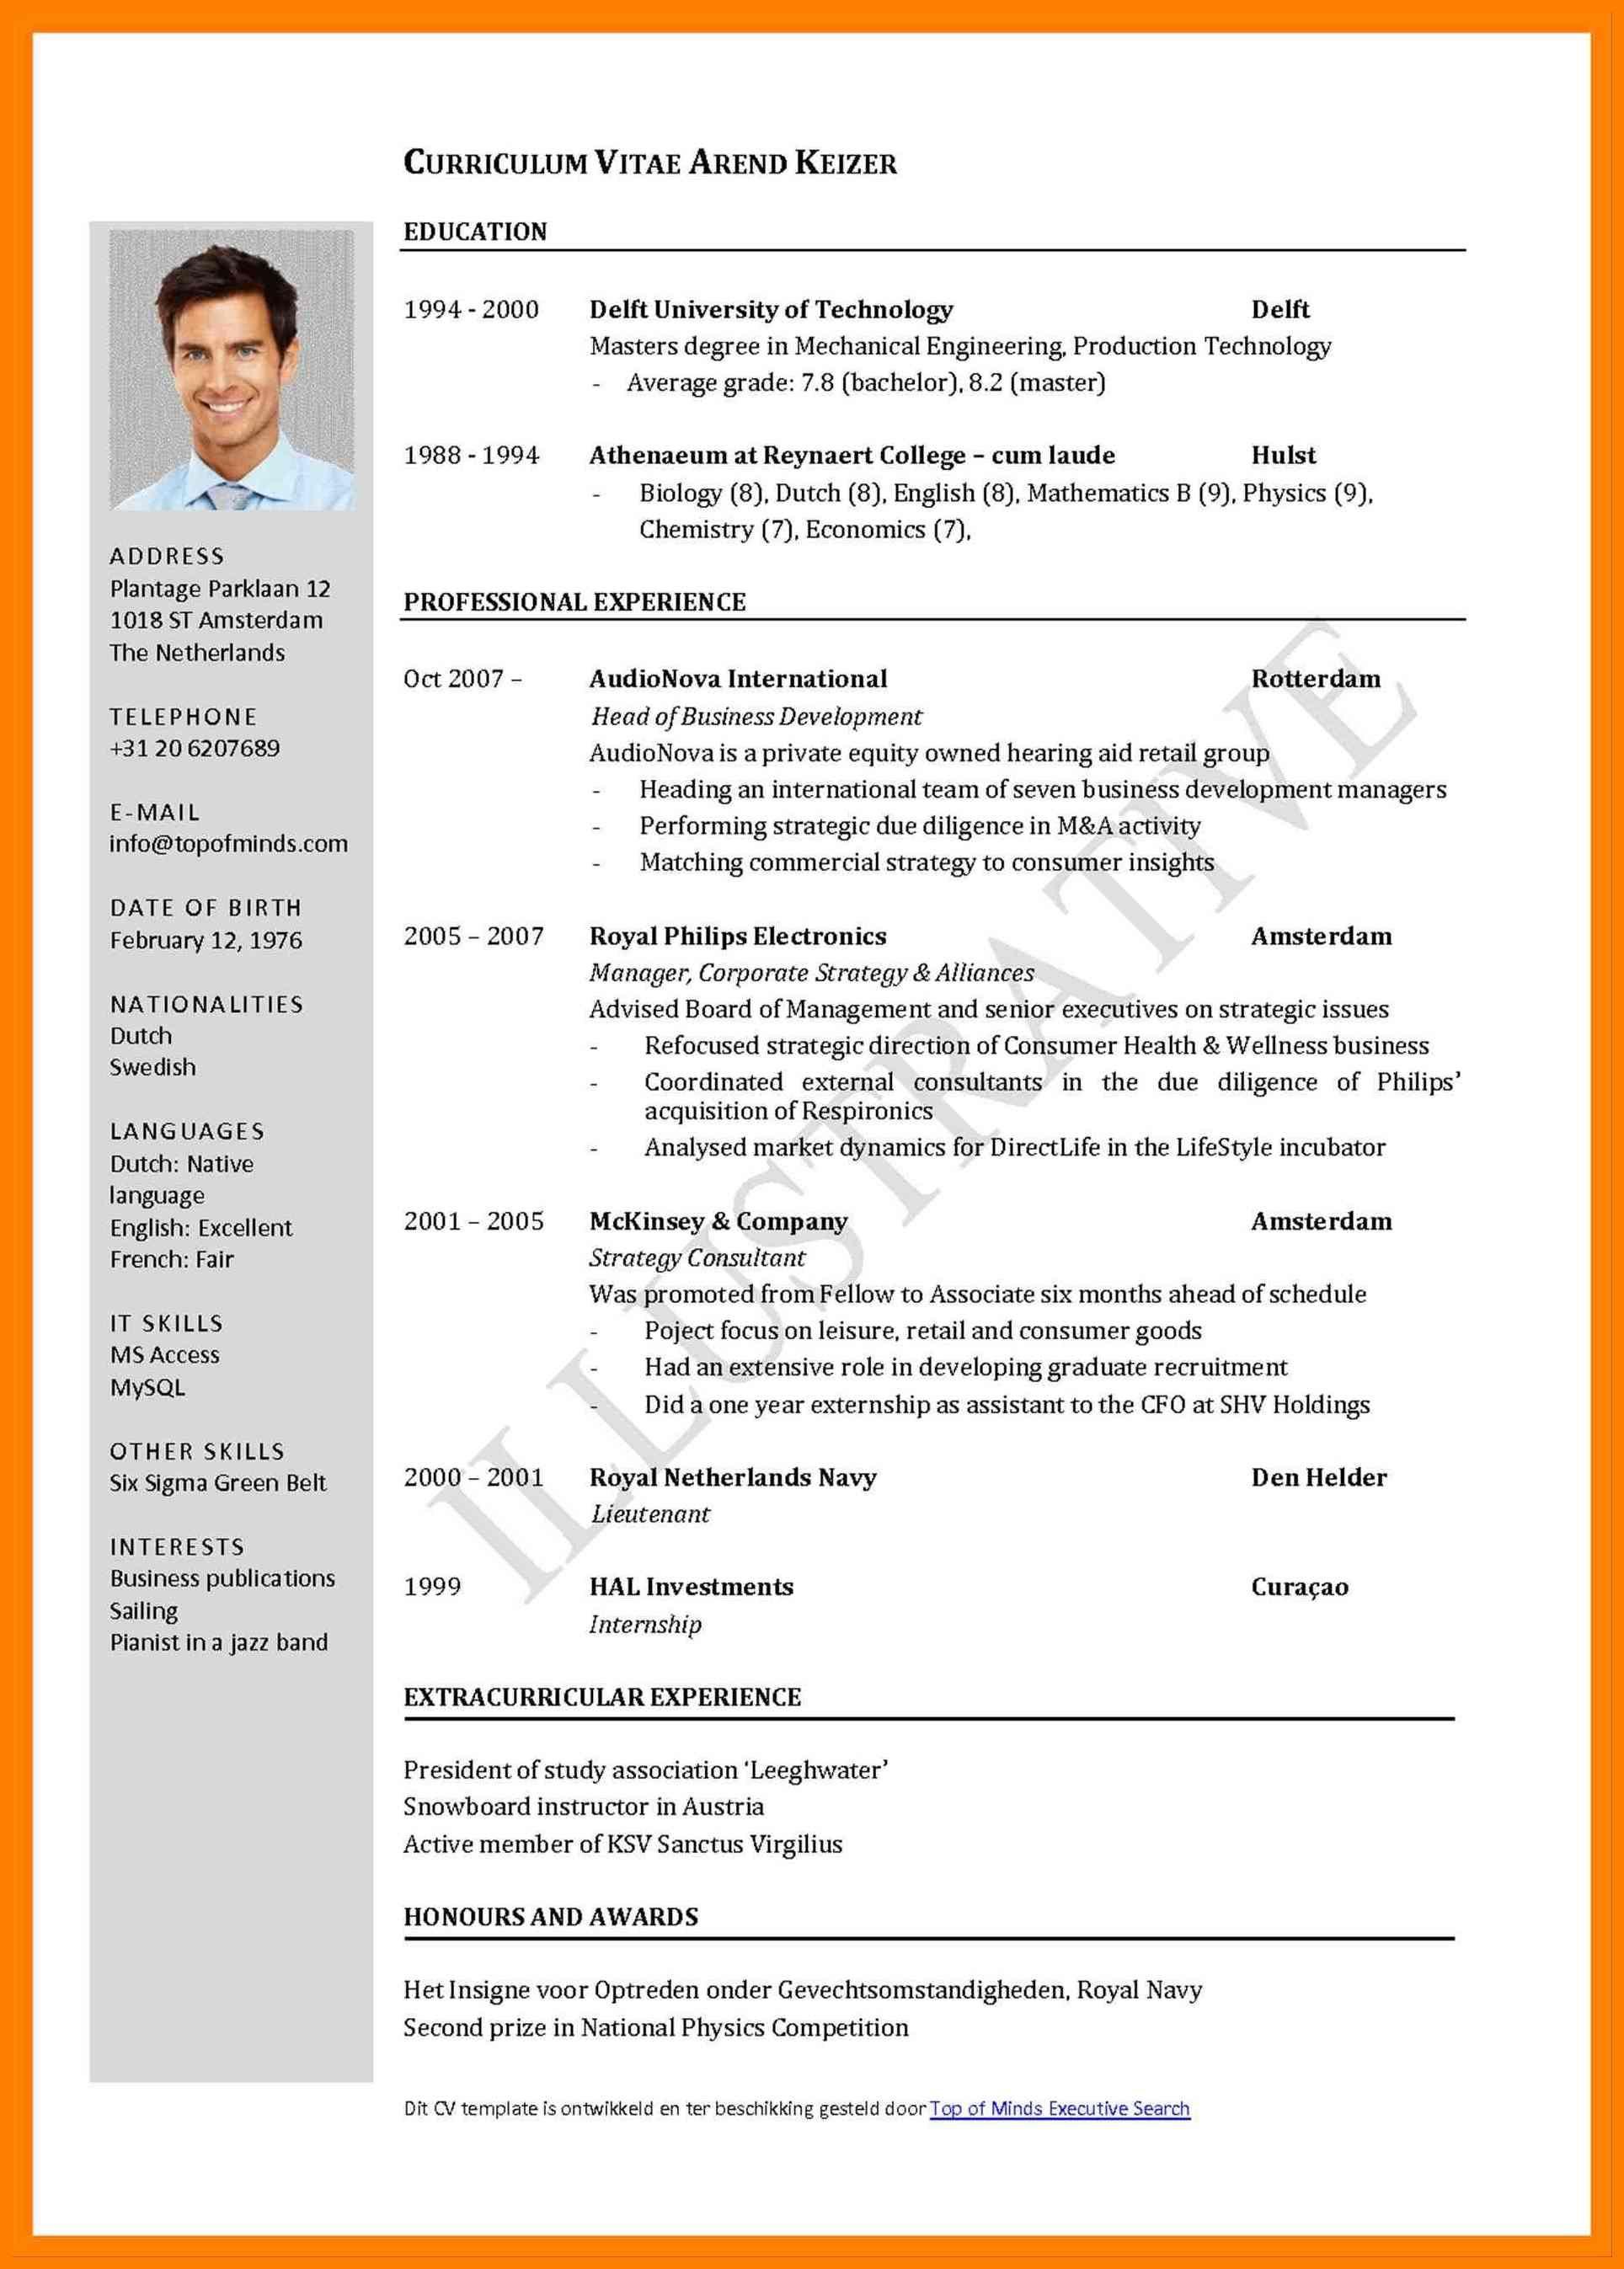 Cv Template Bangladesh Curriculum vitae format, Cv